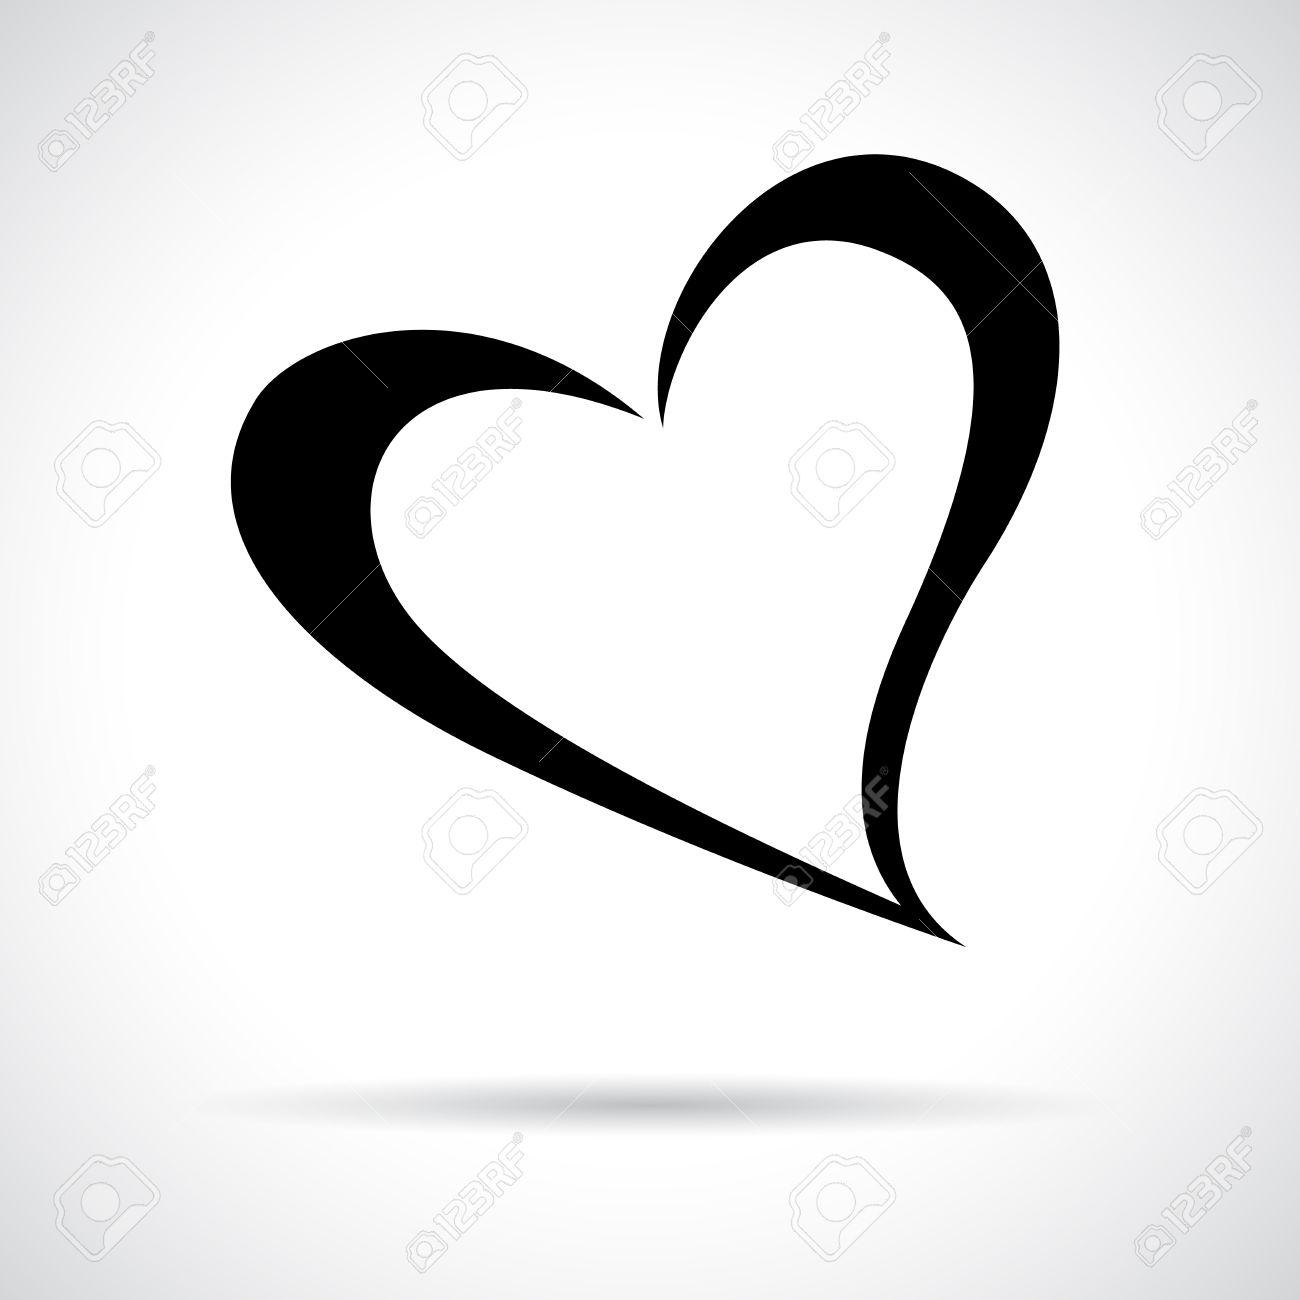 Heart icon black flat symbol in a circle love concept royalty black flat symbol in a circle love concept stock vector 32053079 buycottarizona